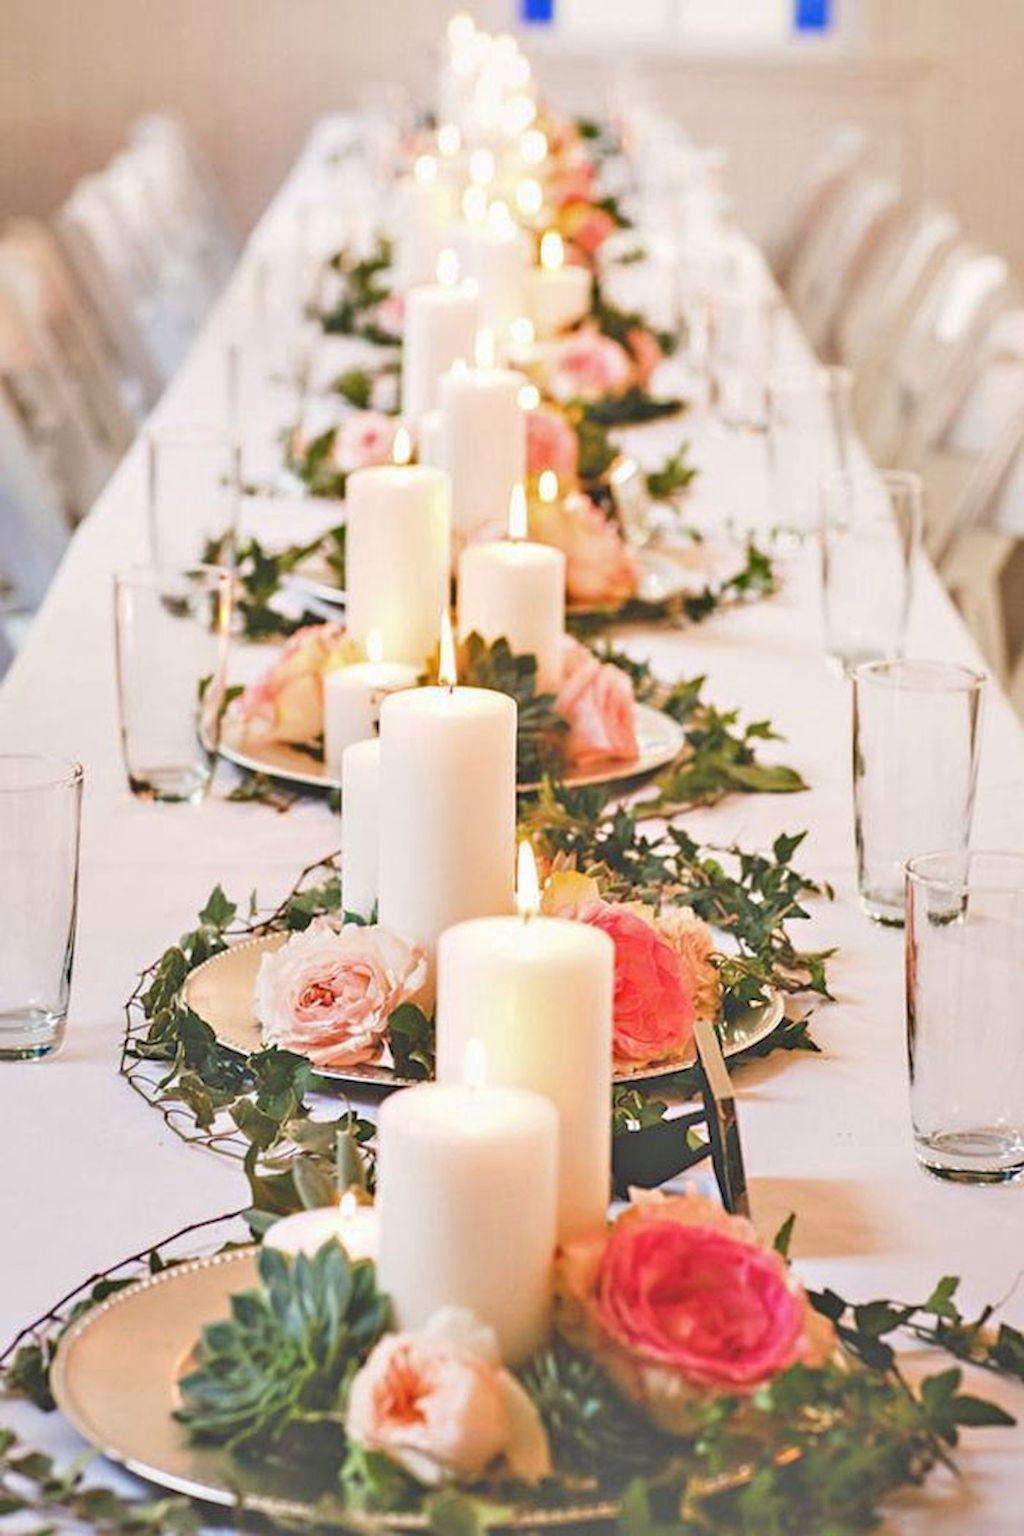 Wedding decoration ideas home   Simple Greenery Wedding Centerpieces Decor Ideas  Home Deco